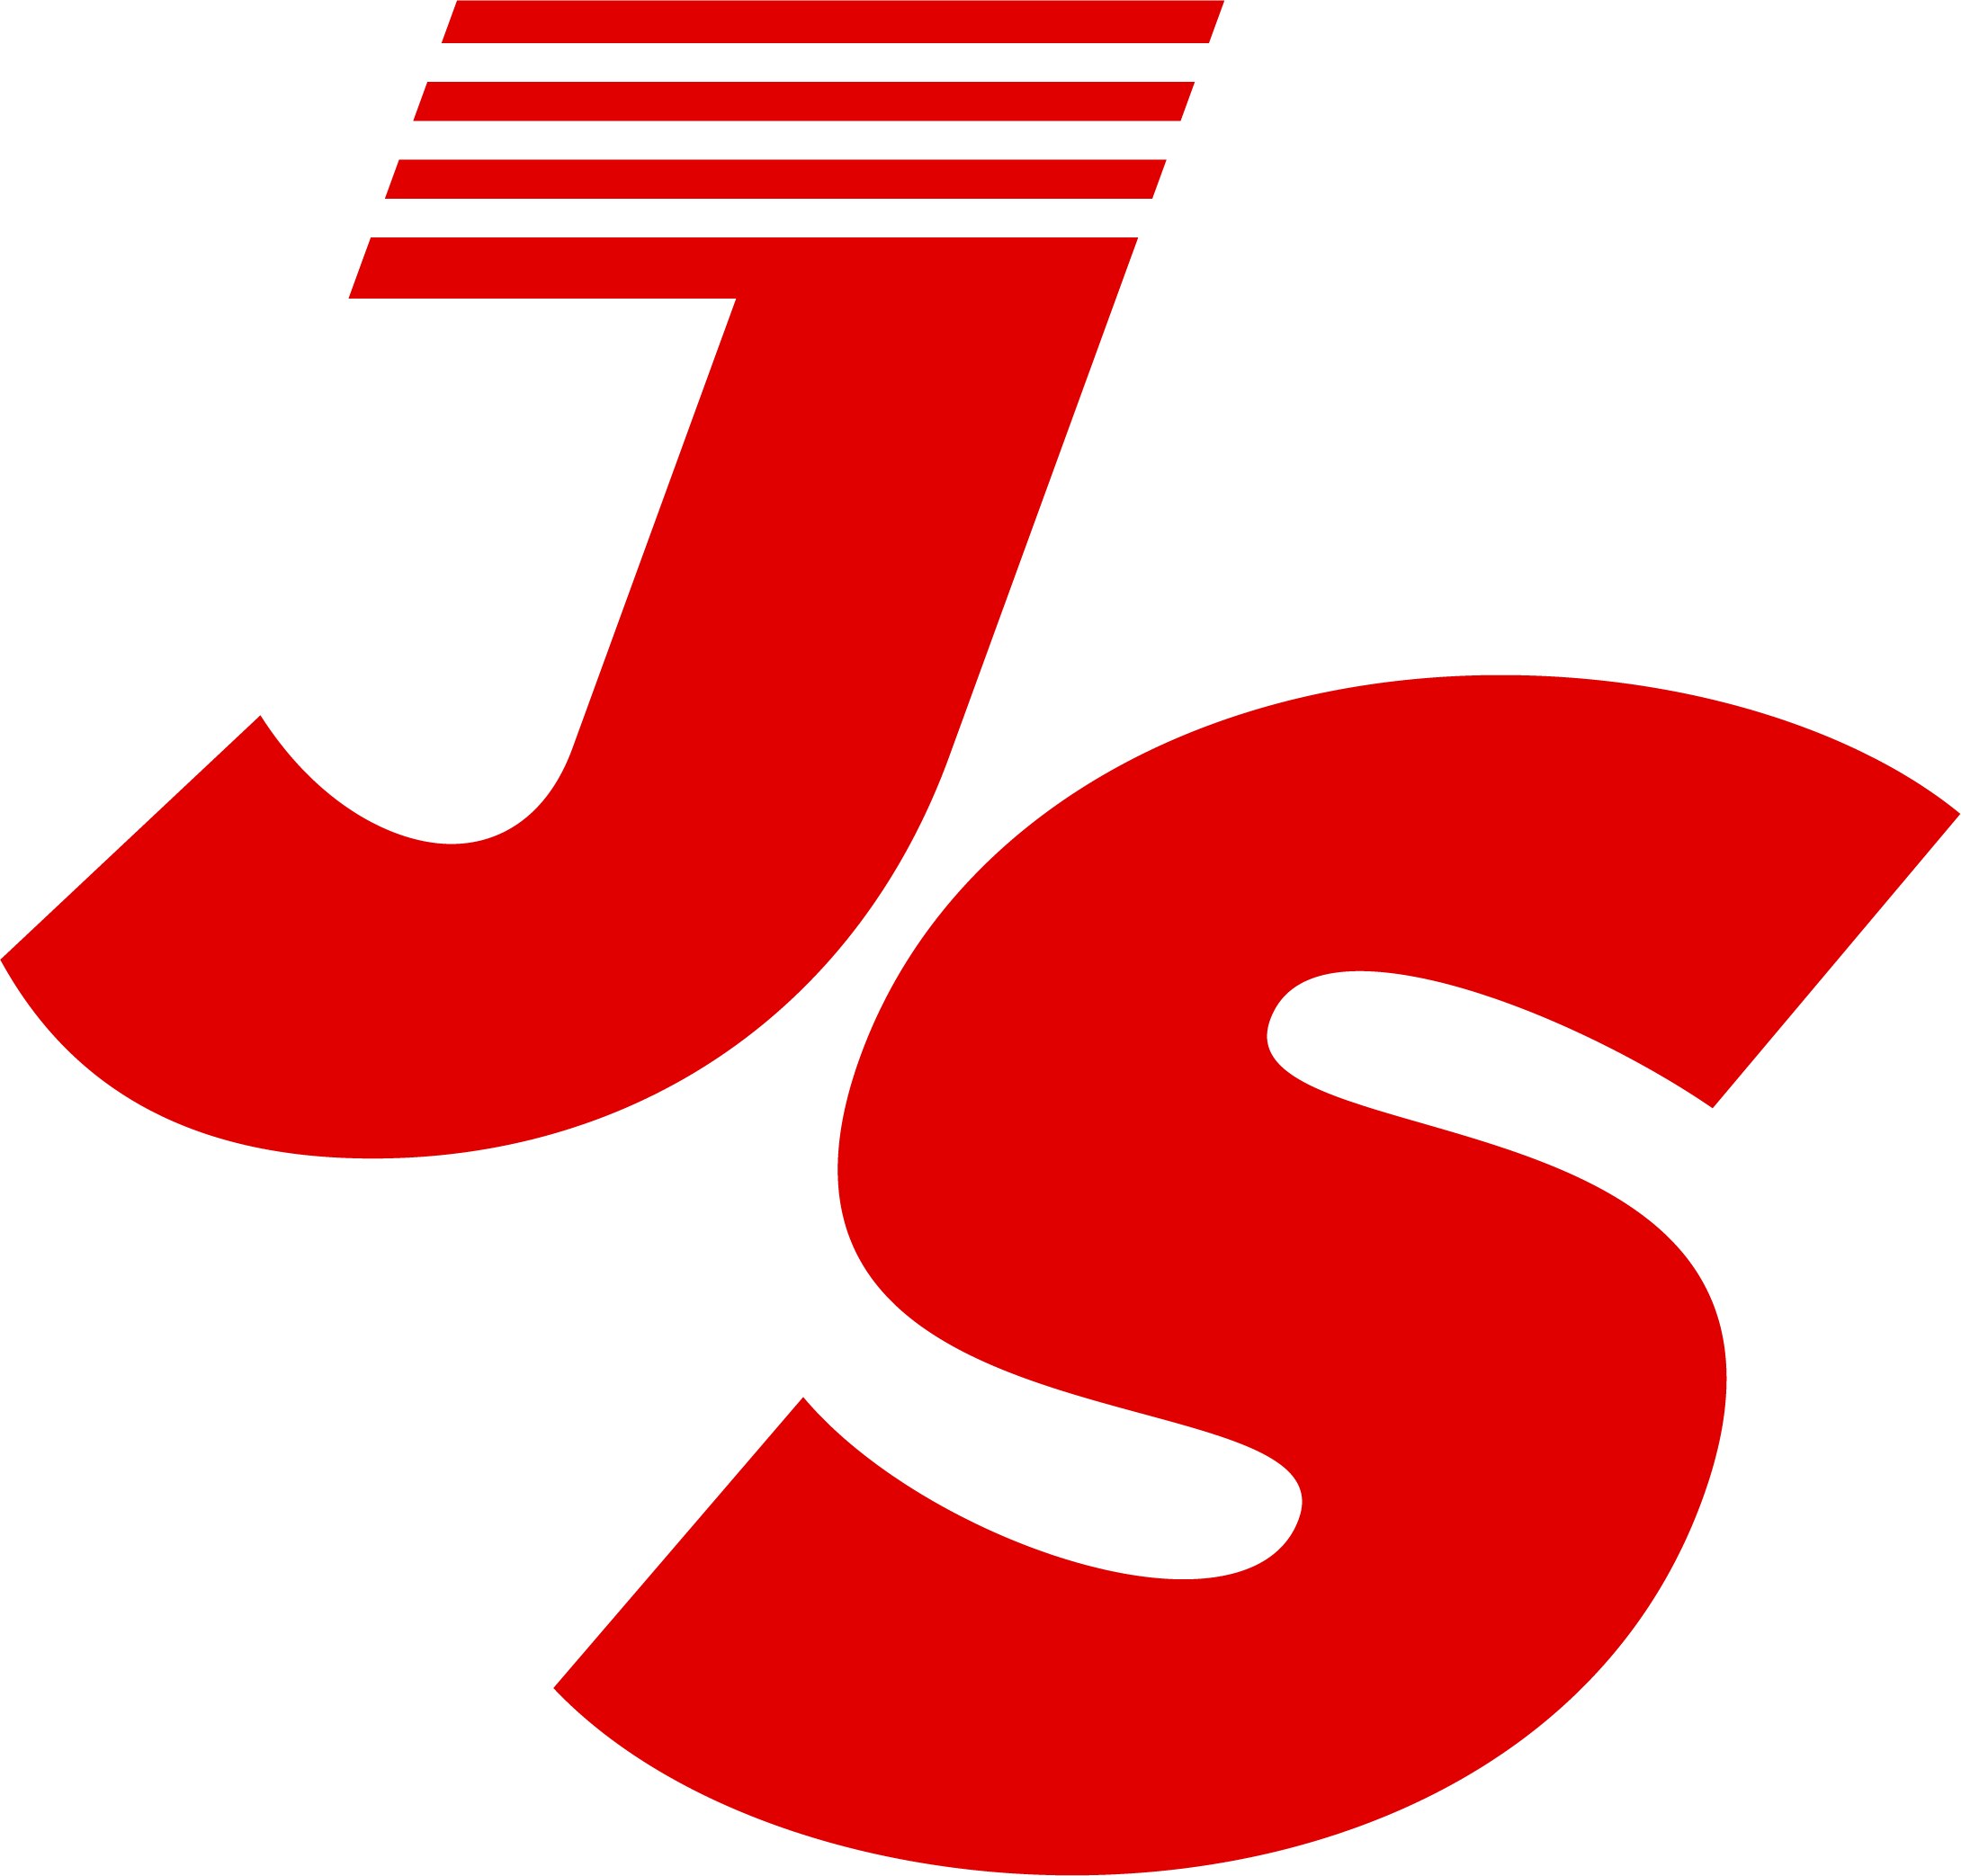 JuyenSebulba-Logo-Initials-Red.png